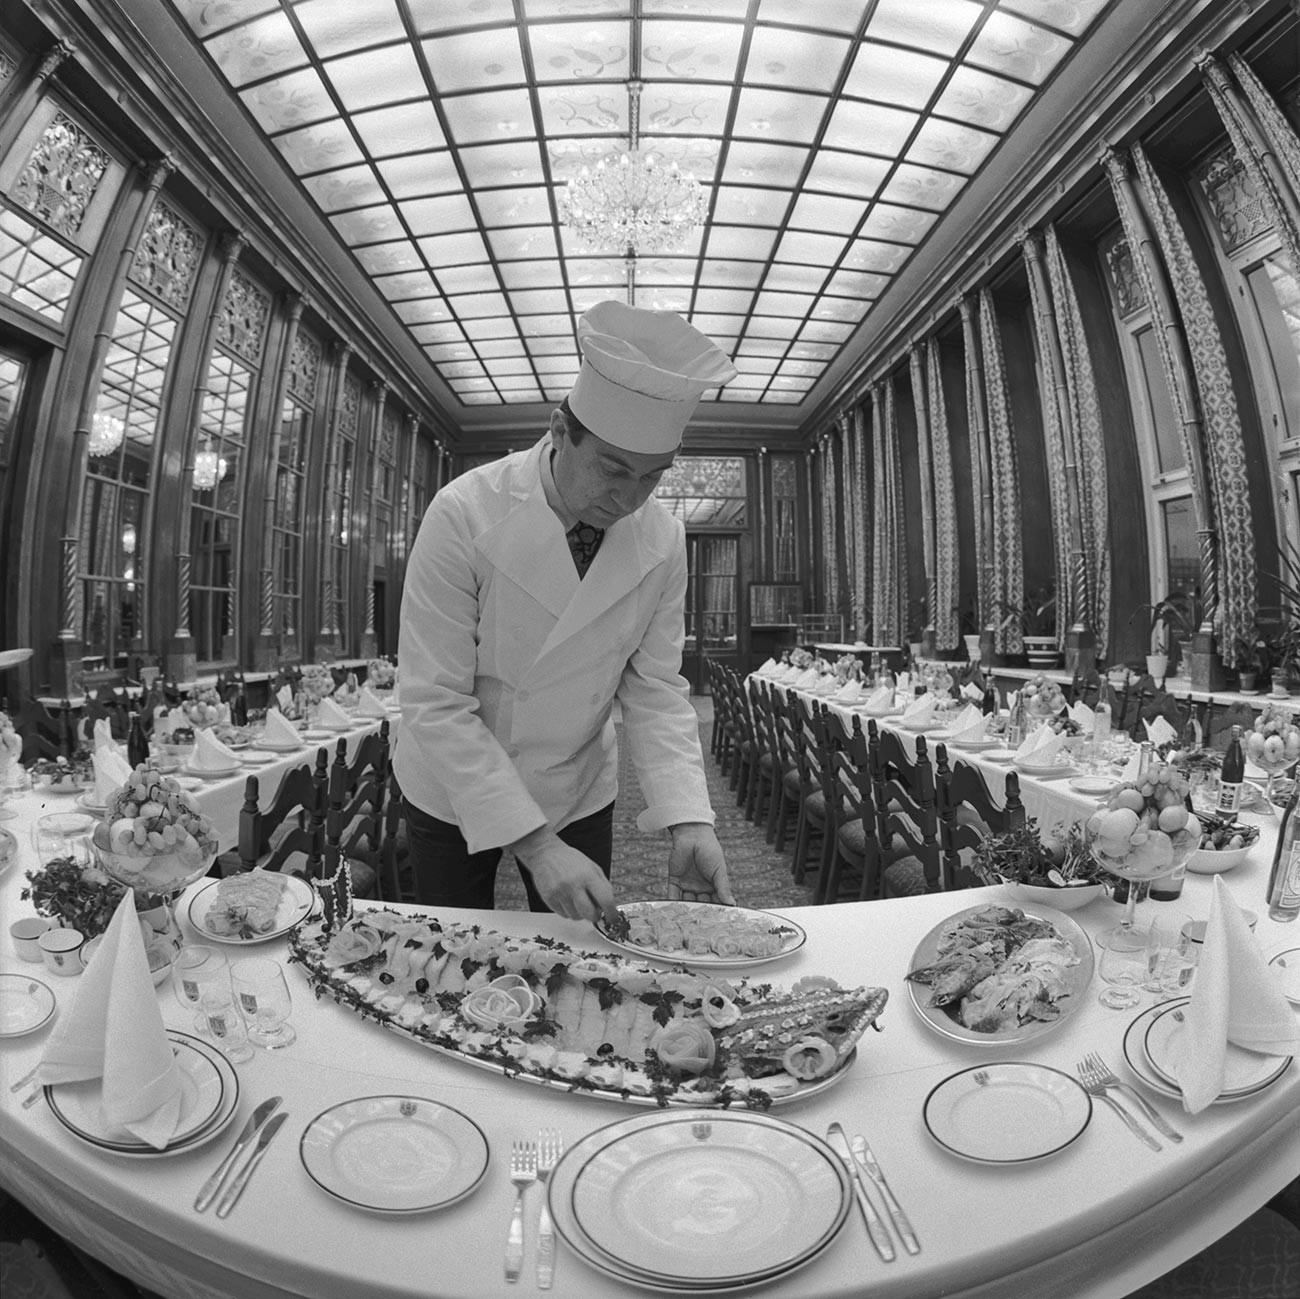 The Mirror Hall of the Praga restaurant.